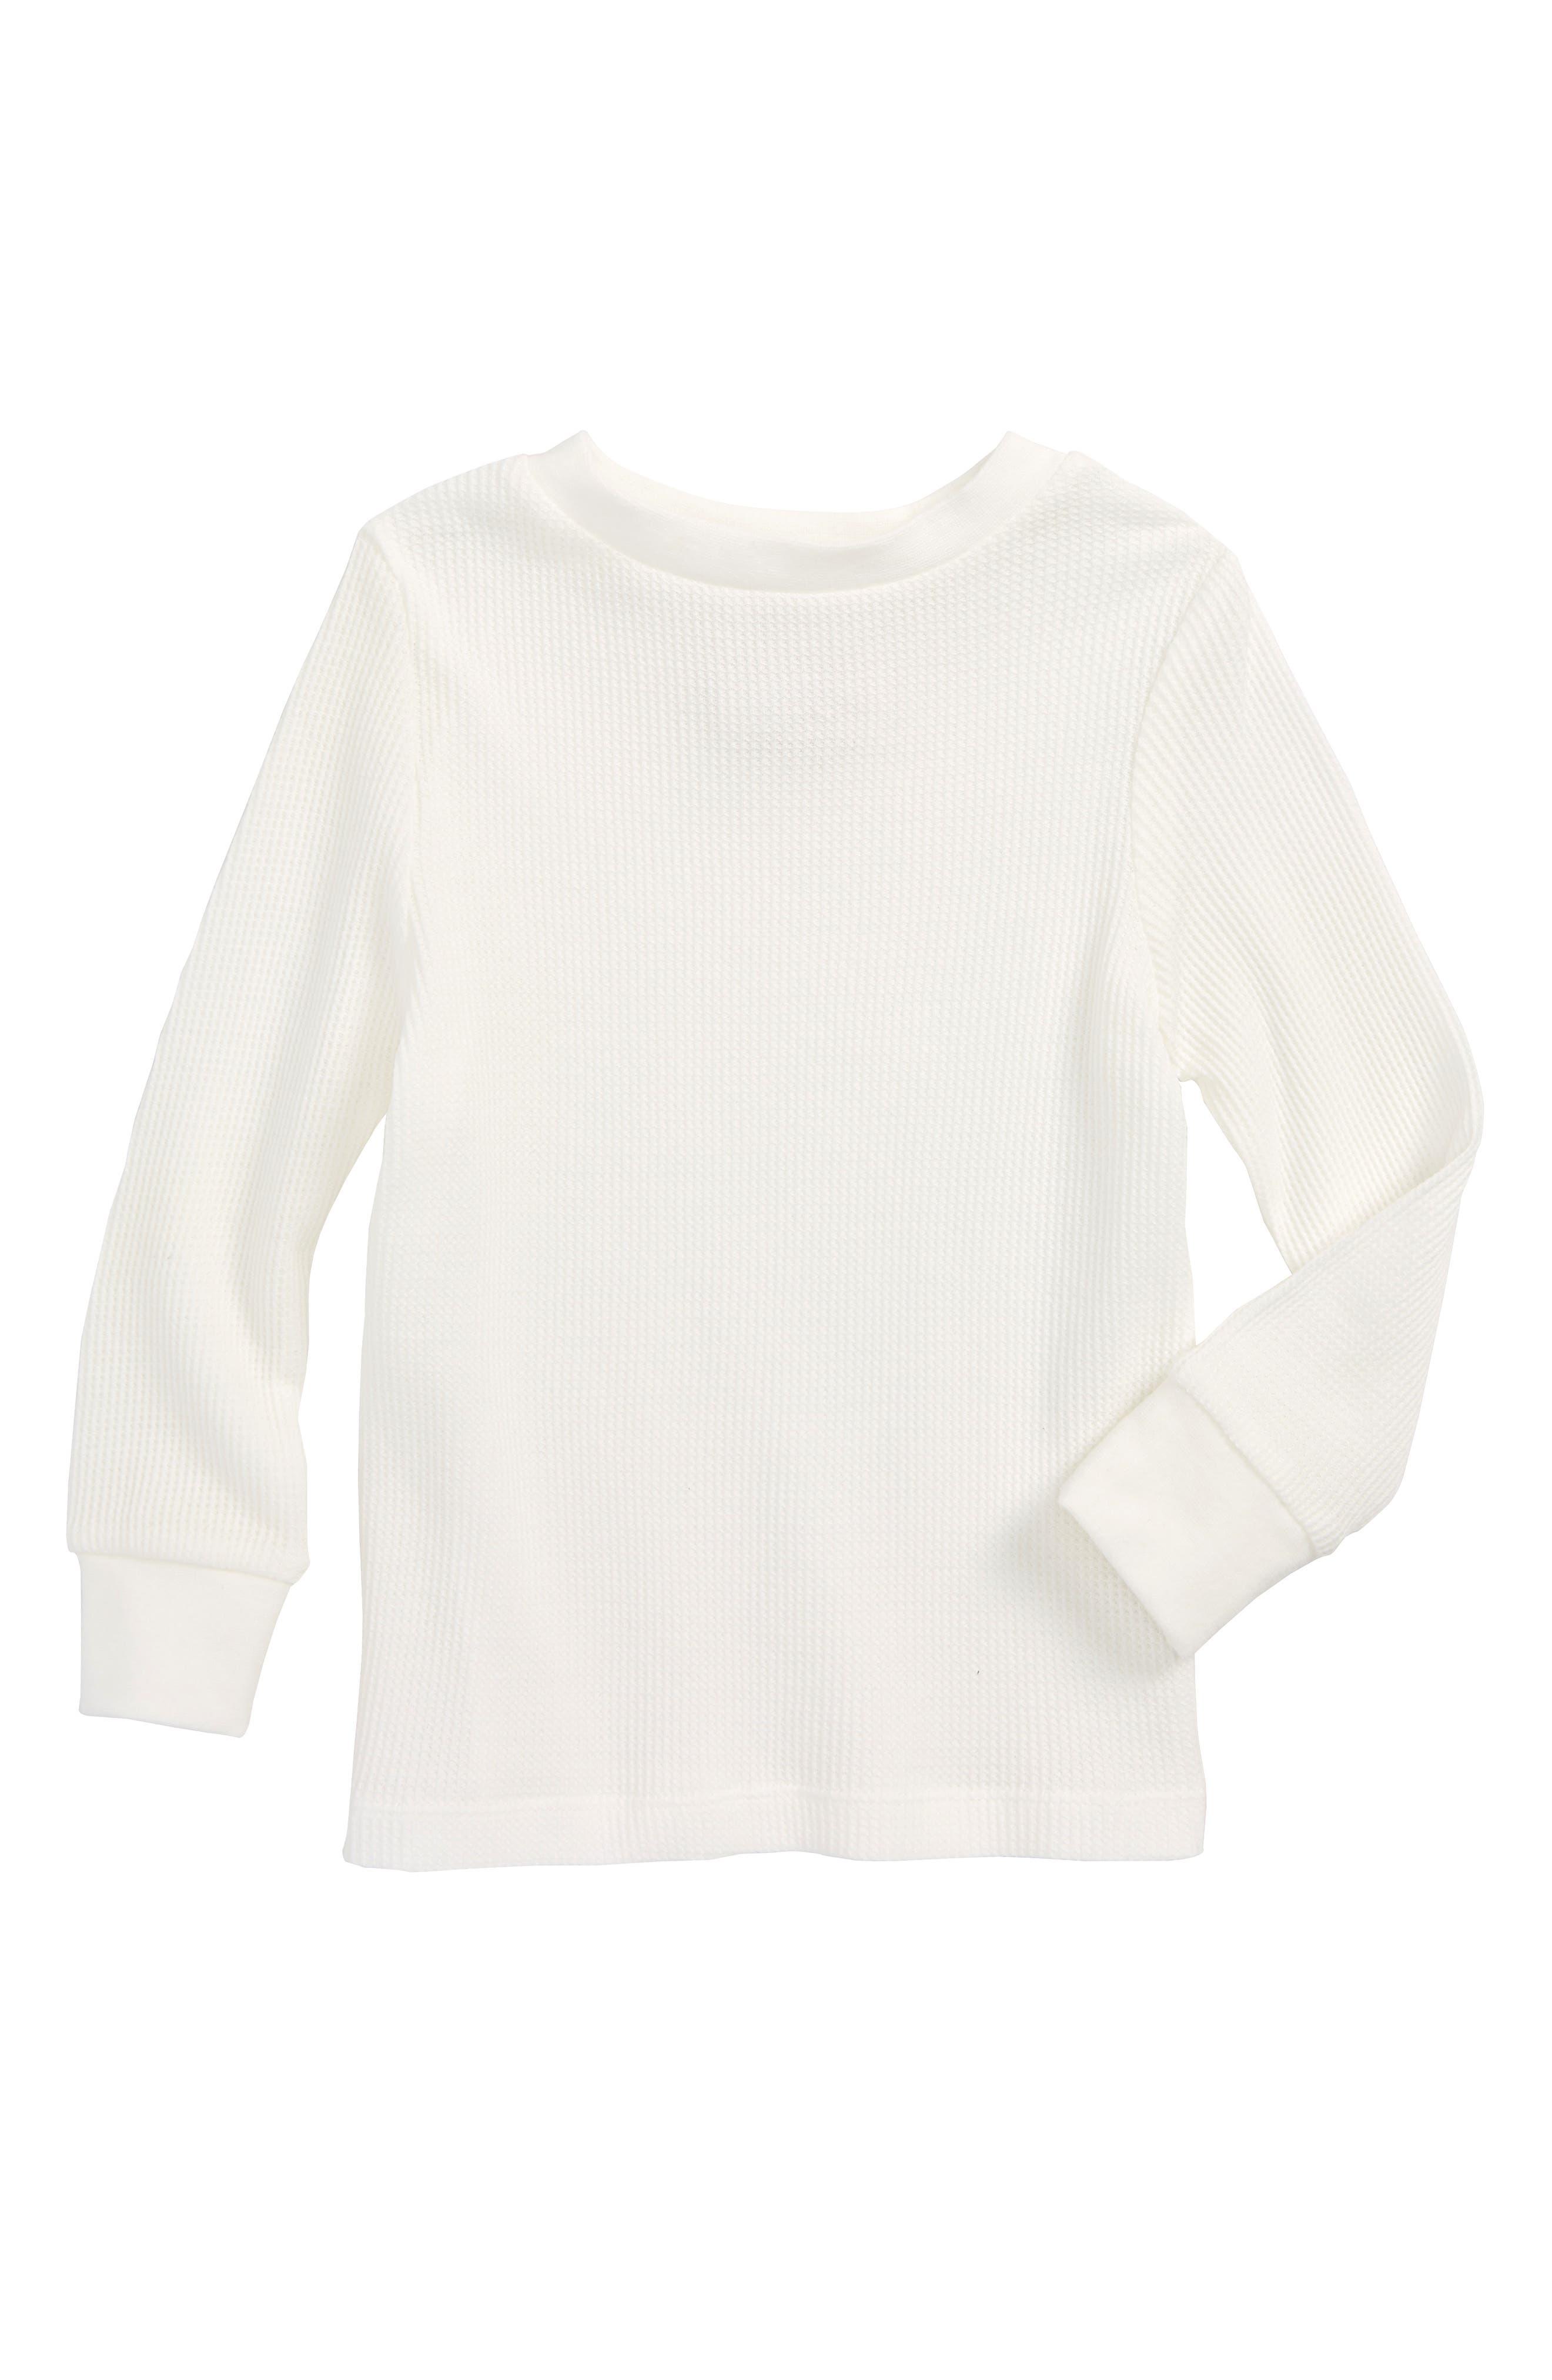 Alternate Image 1 Selected - Peek Thermal T-Shirt (Toddler Boys, Little Boys & Big Boys)